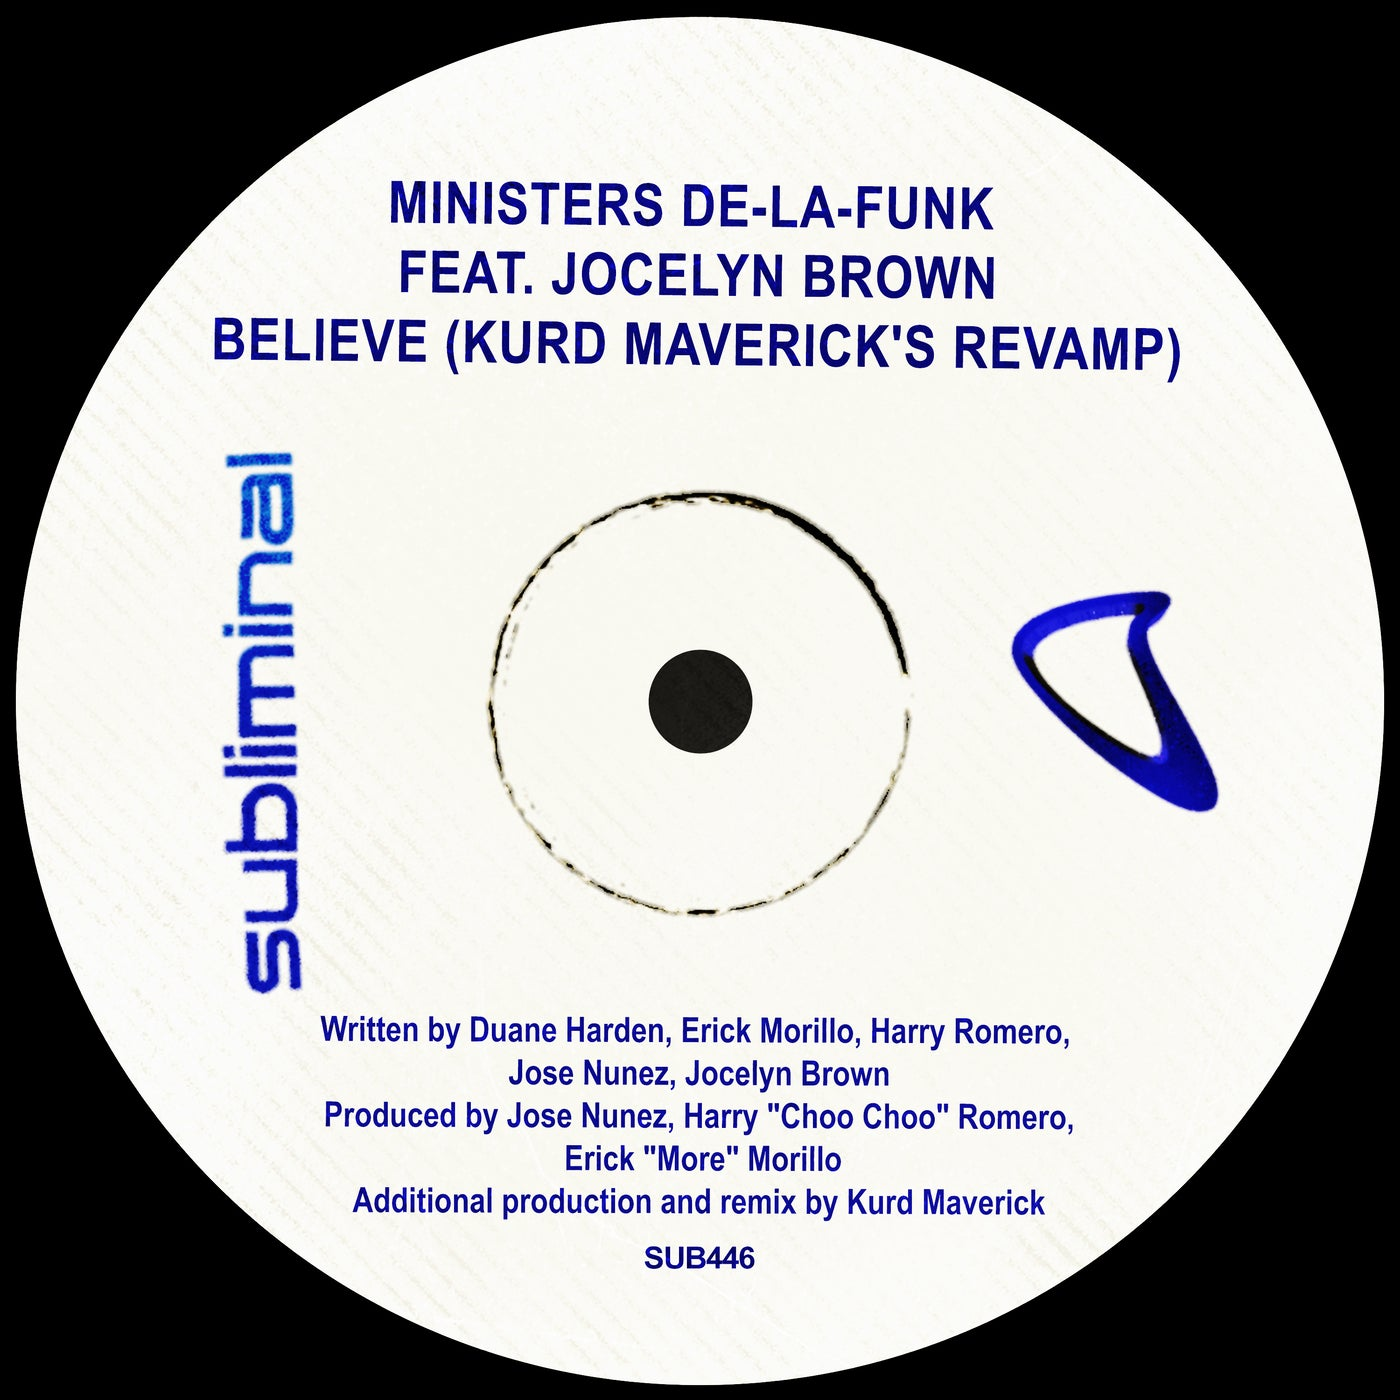 Believe feat. Jocelyn Brown (Kurd Maverick Extended Revamp)